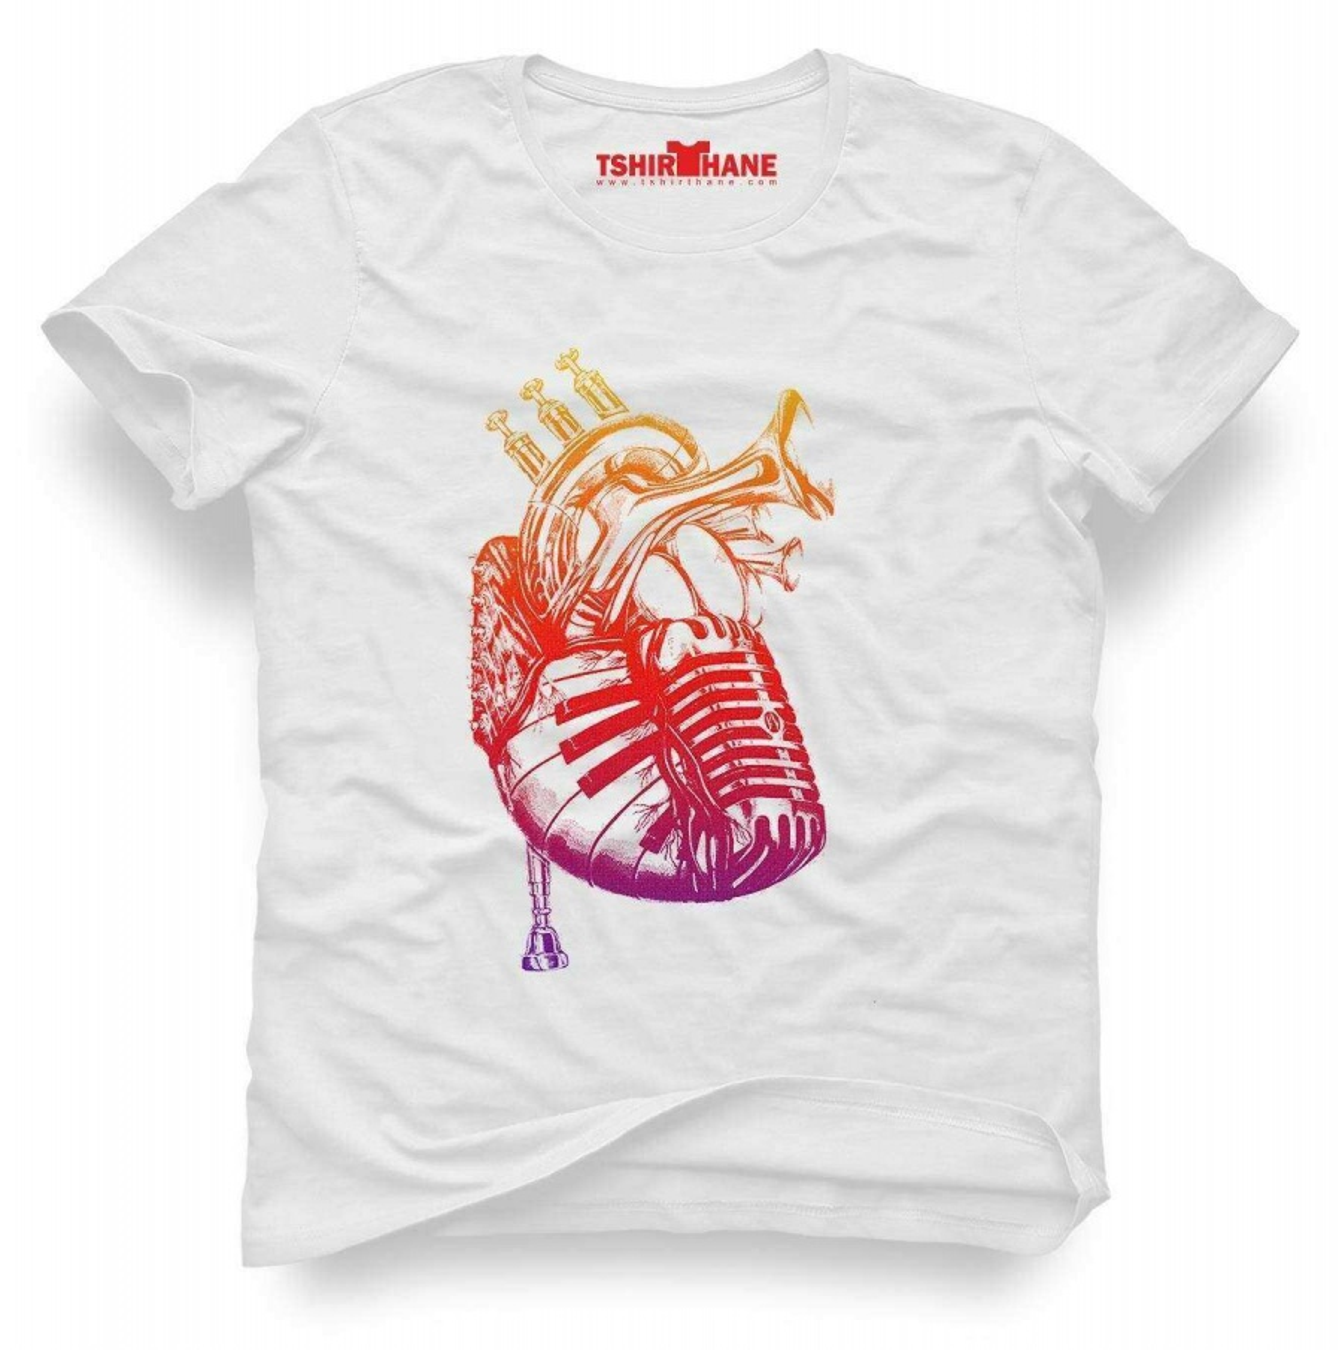 Tshirthane Kalbim müzikle çarpiyor Tişört Erkek Tshirt